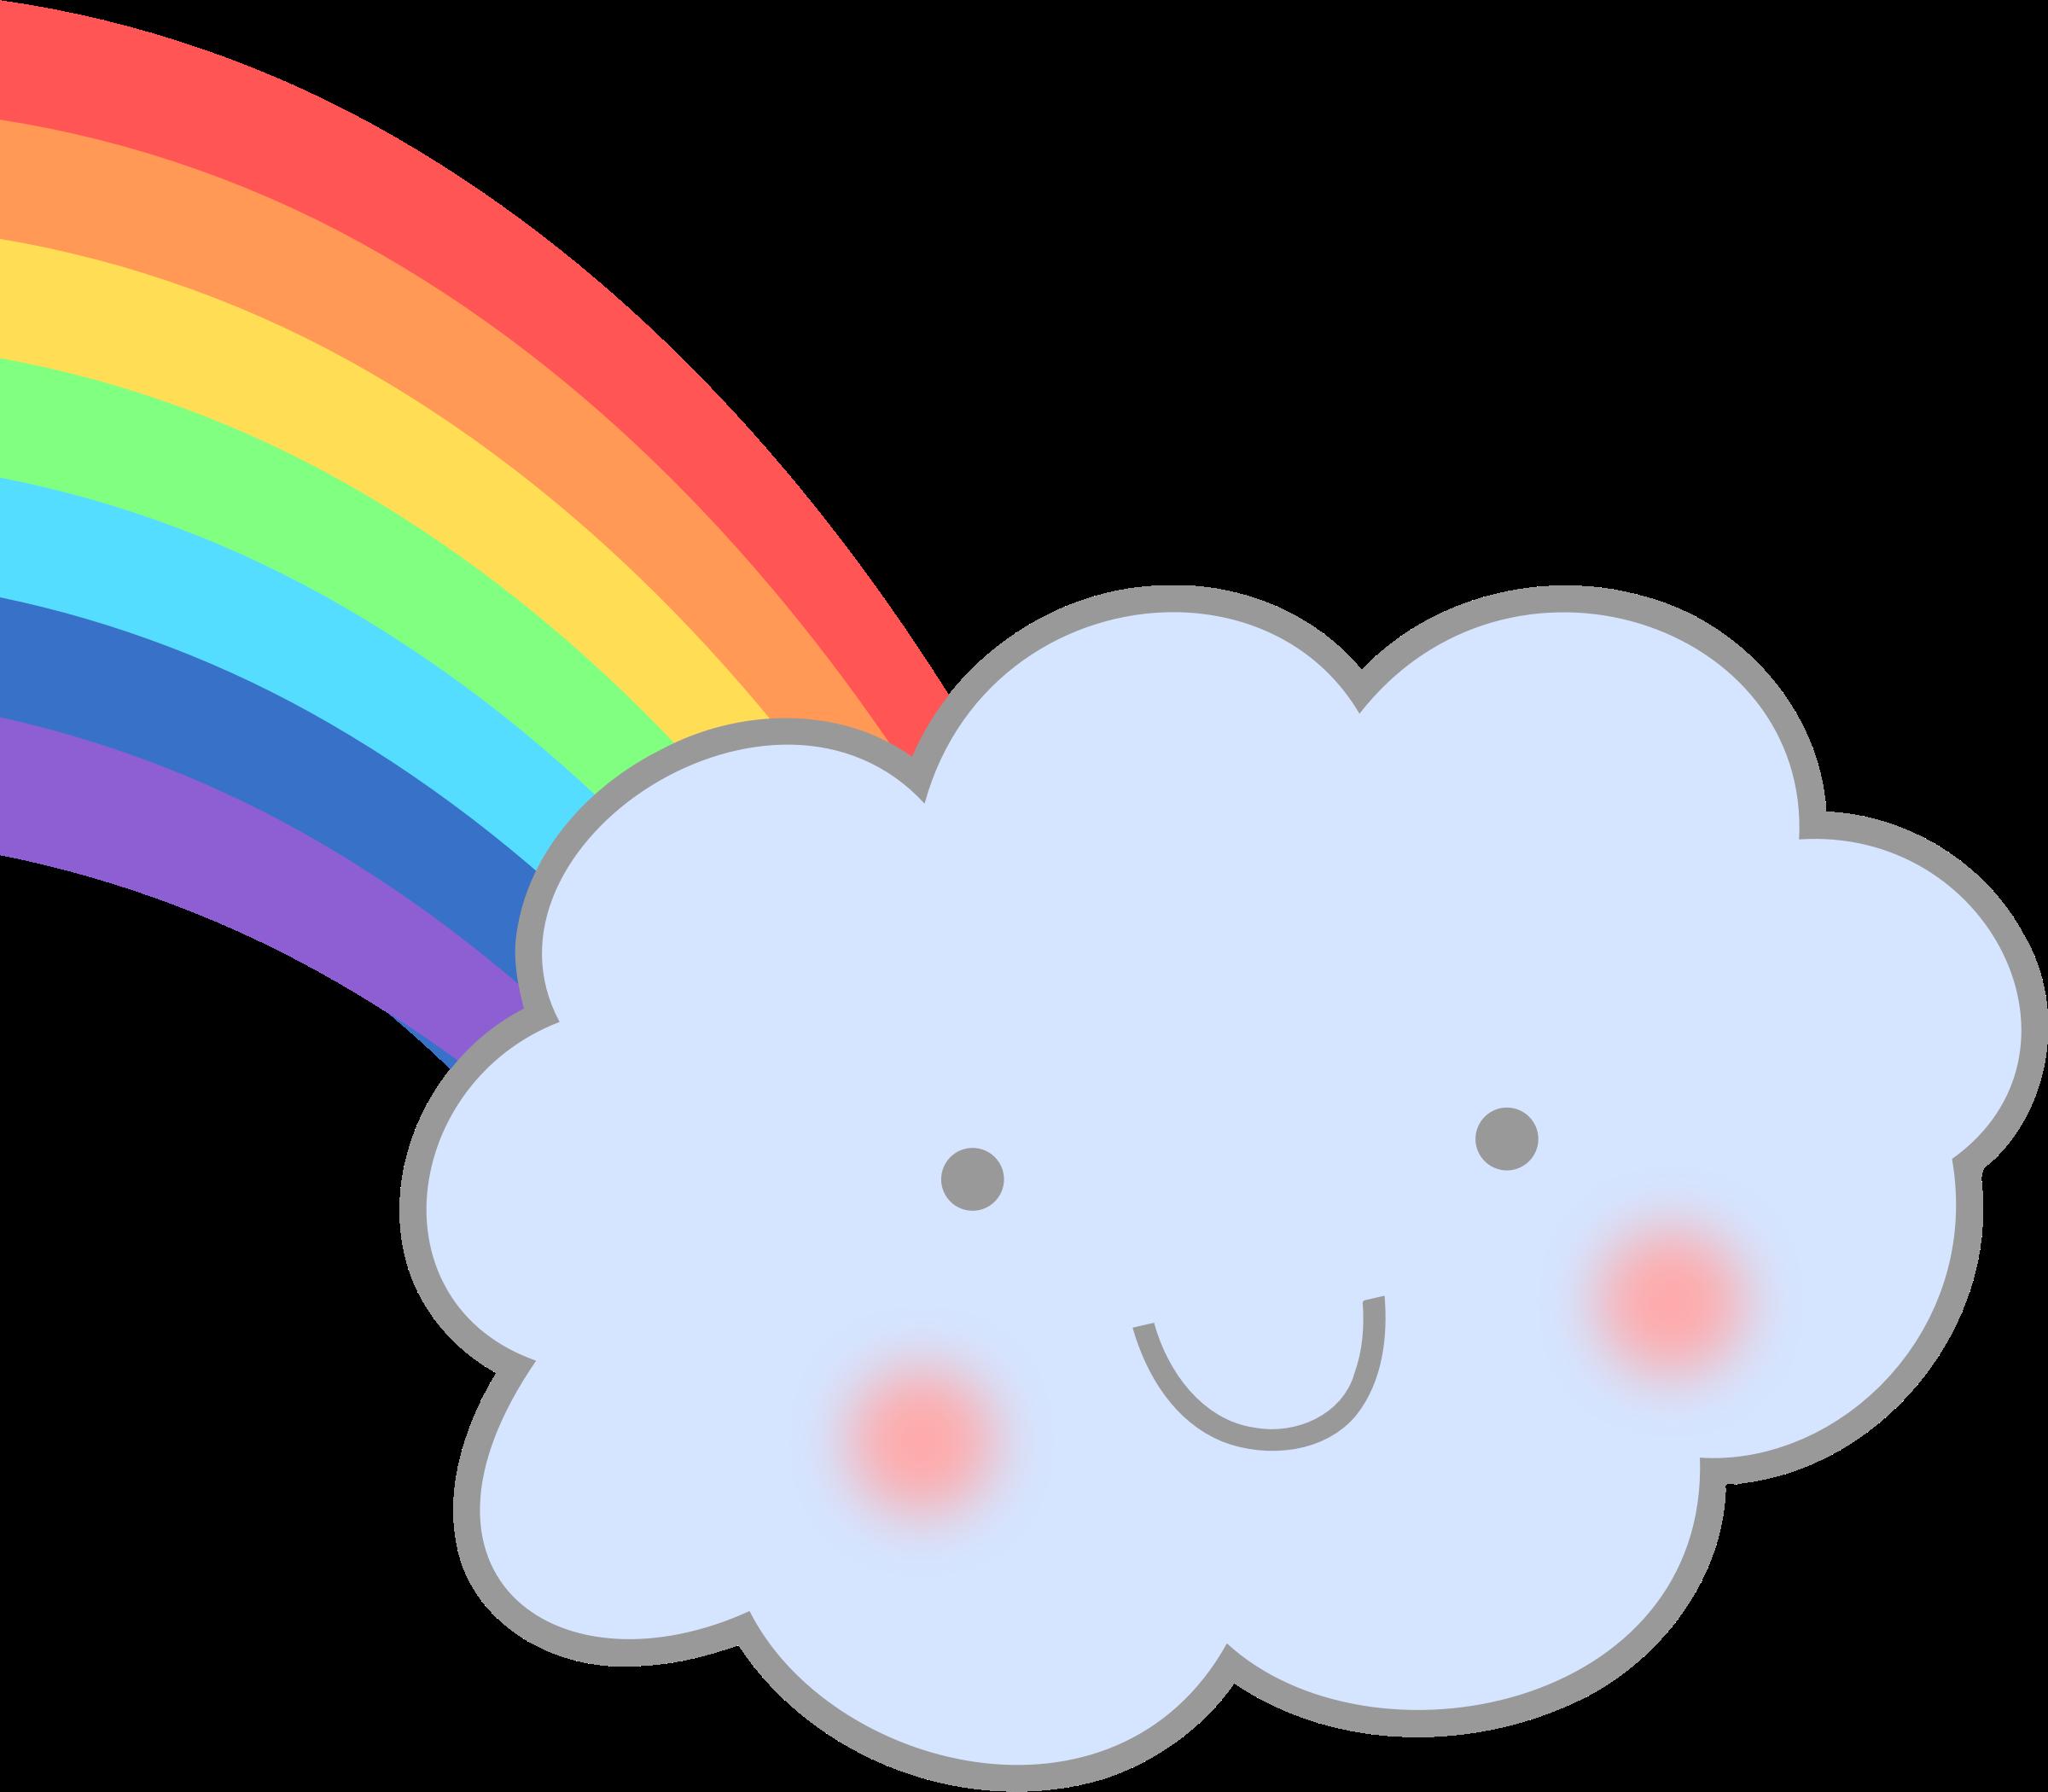 Clouds clipart cute cartoon Rainbow with Clipart Cute Cloud